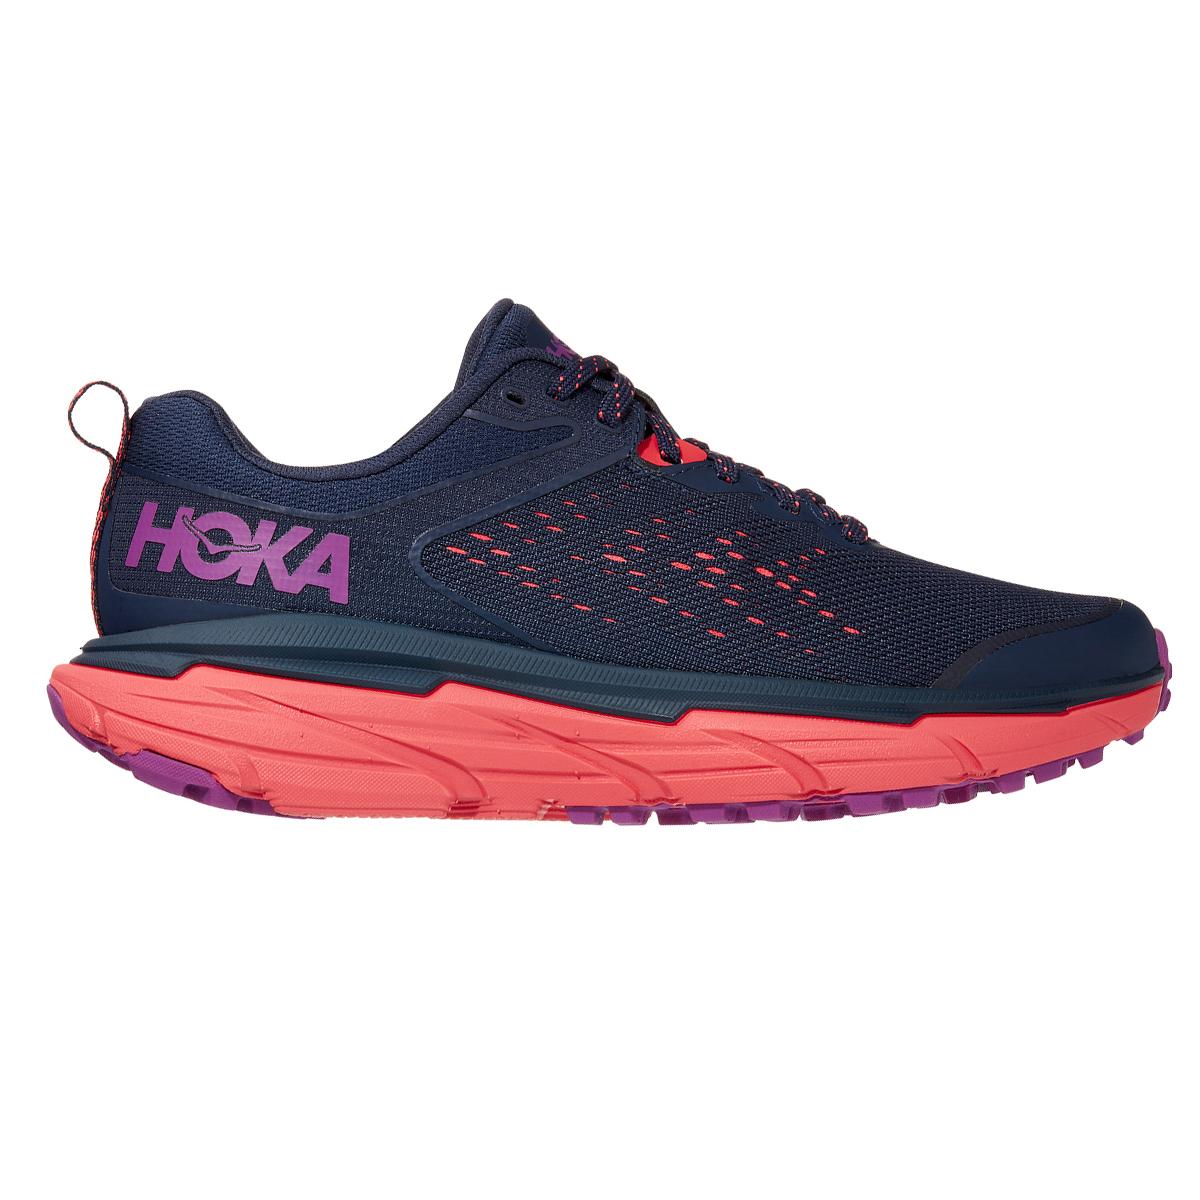 Women's Hoka One One Challenger ATR 6 Running Shoe - Color: Black Iris/Hot Coral - Size: 5 - Width: Regular, Black Iris/Hot Coral, large, image 1